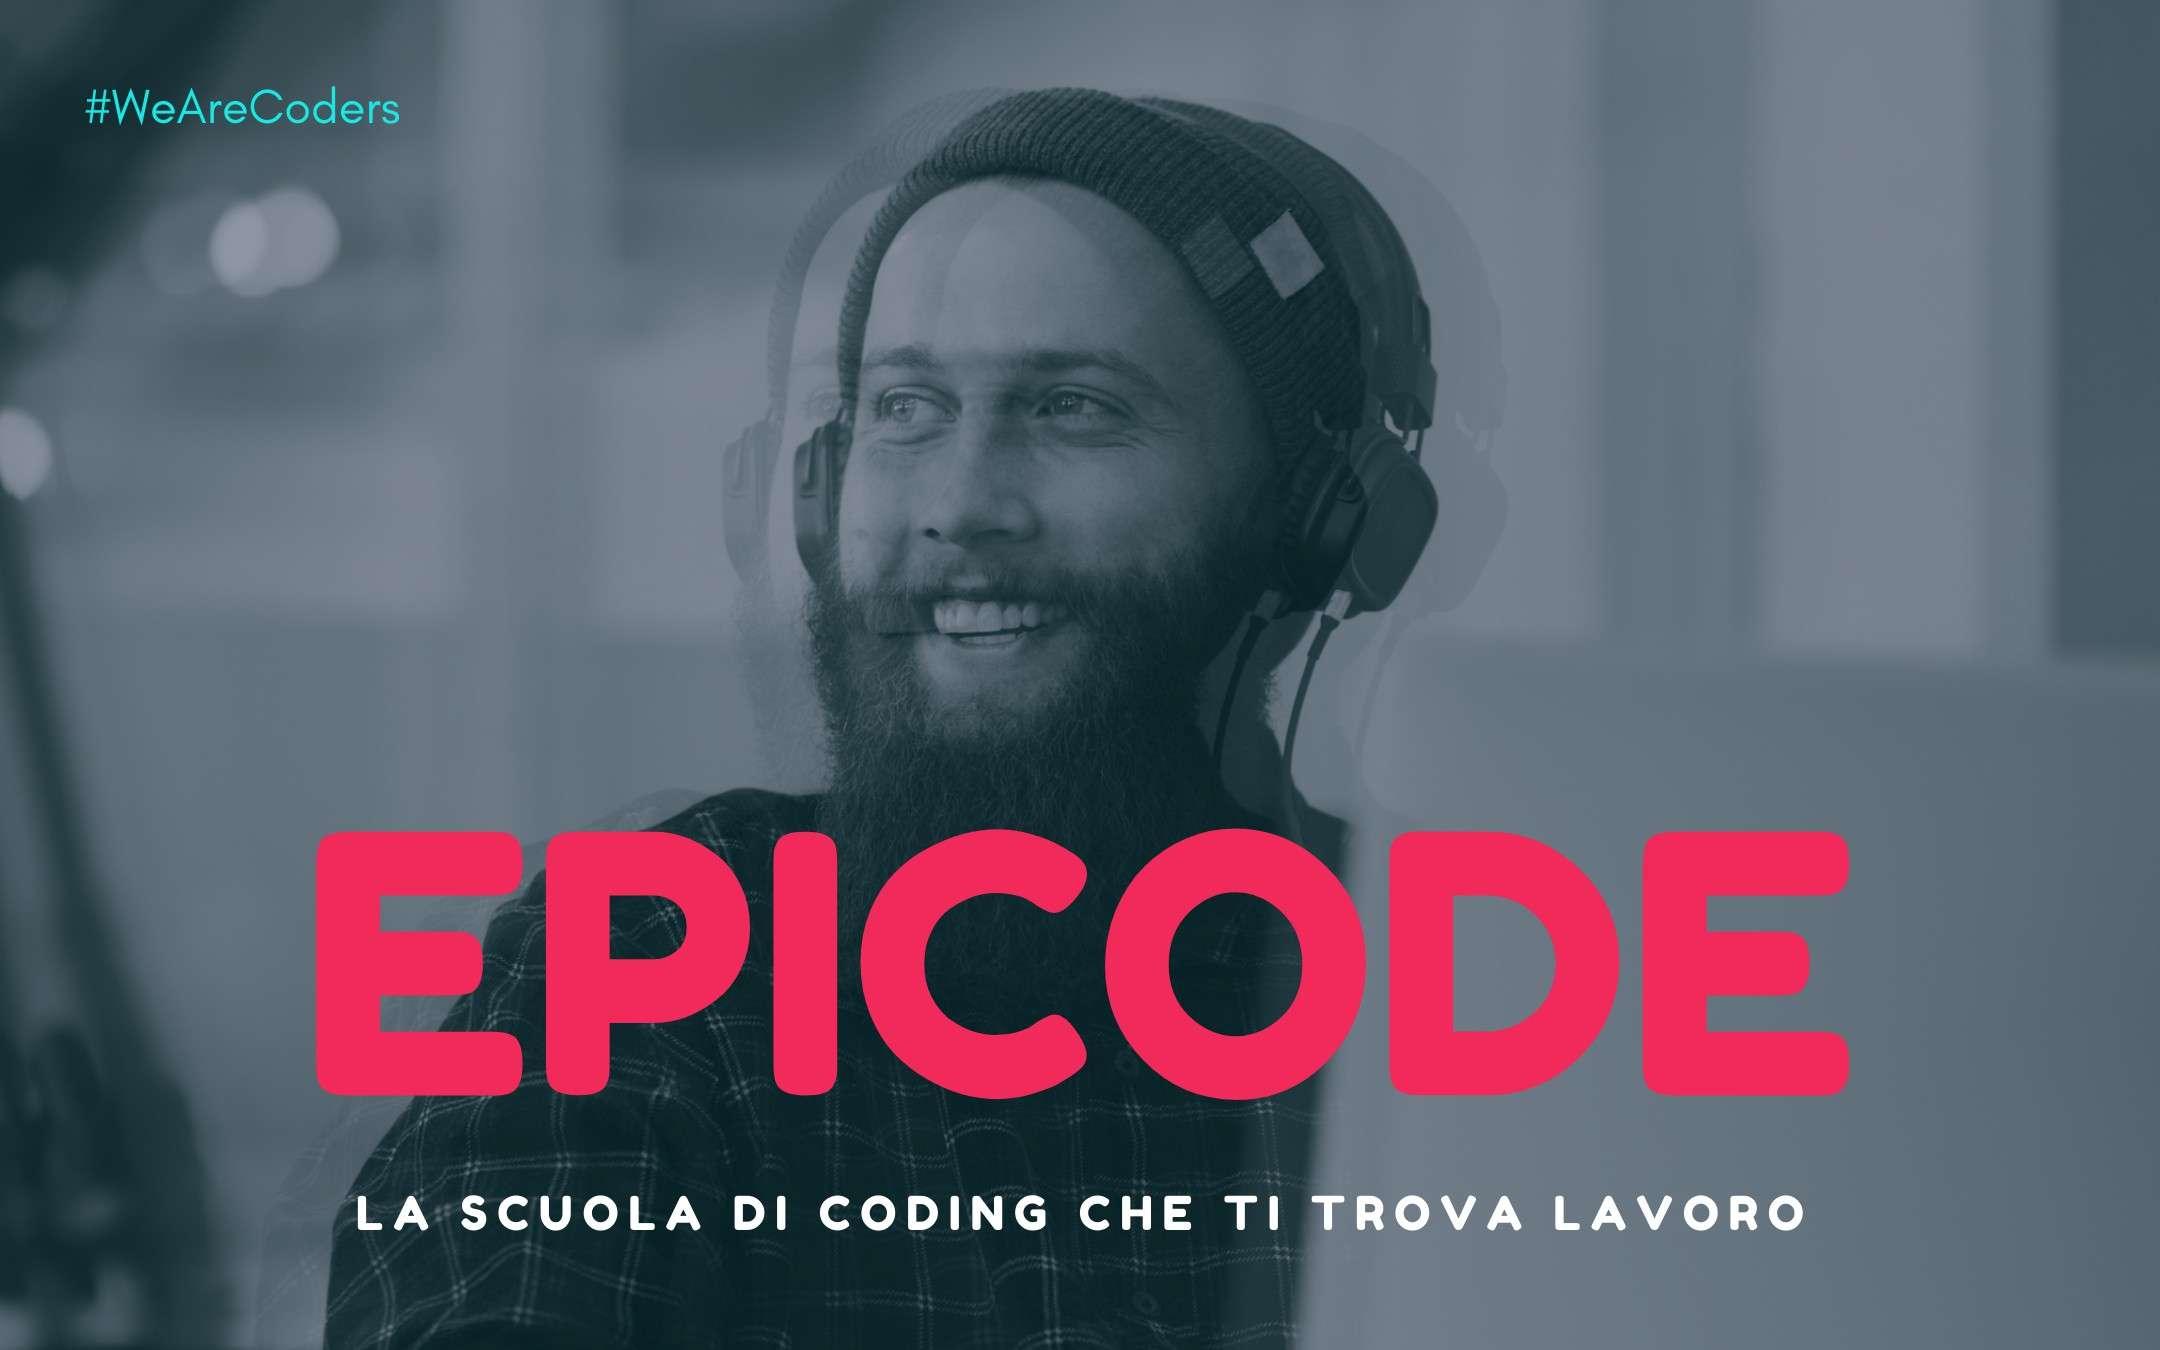 Epicode: Web developer course to find work immediately